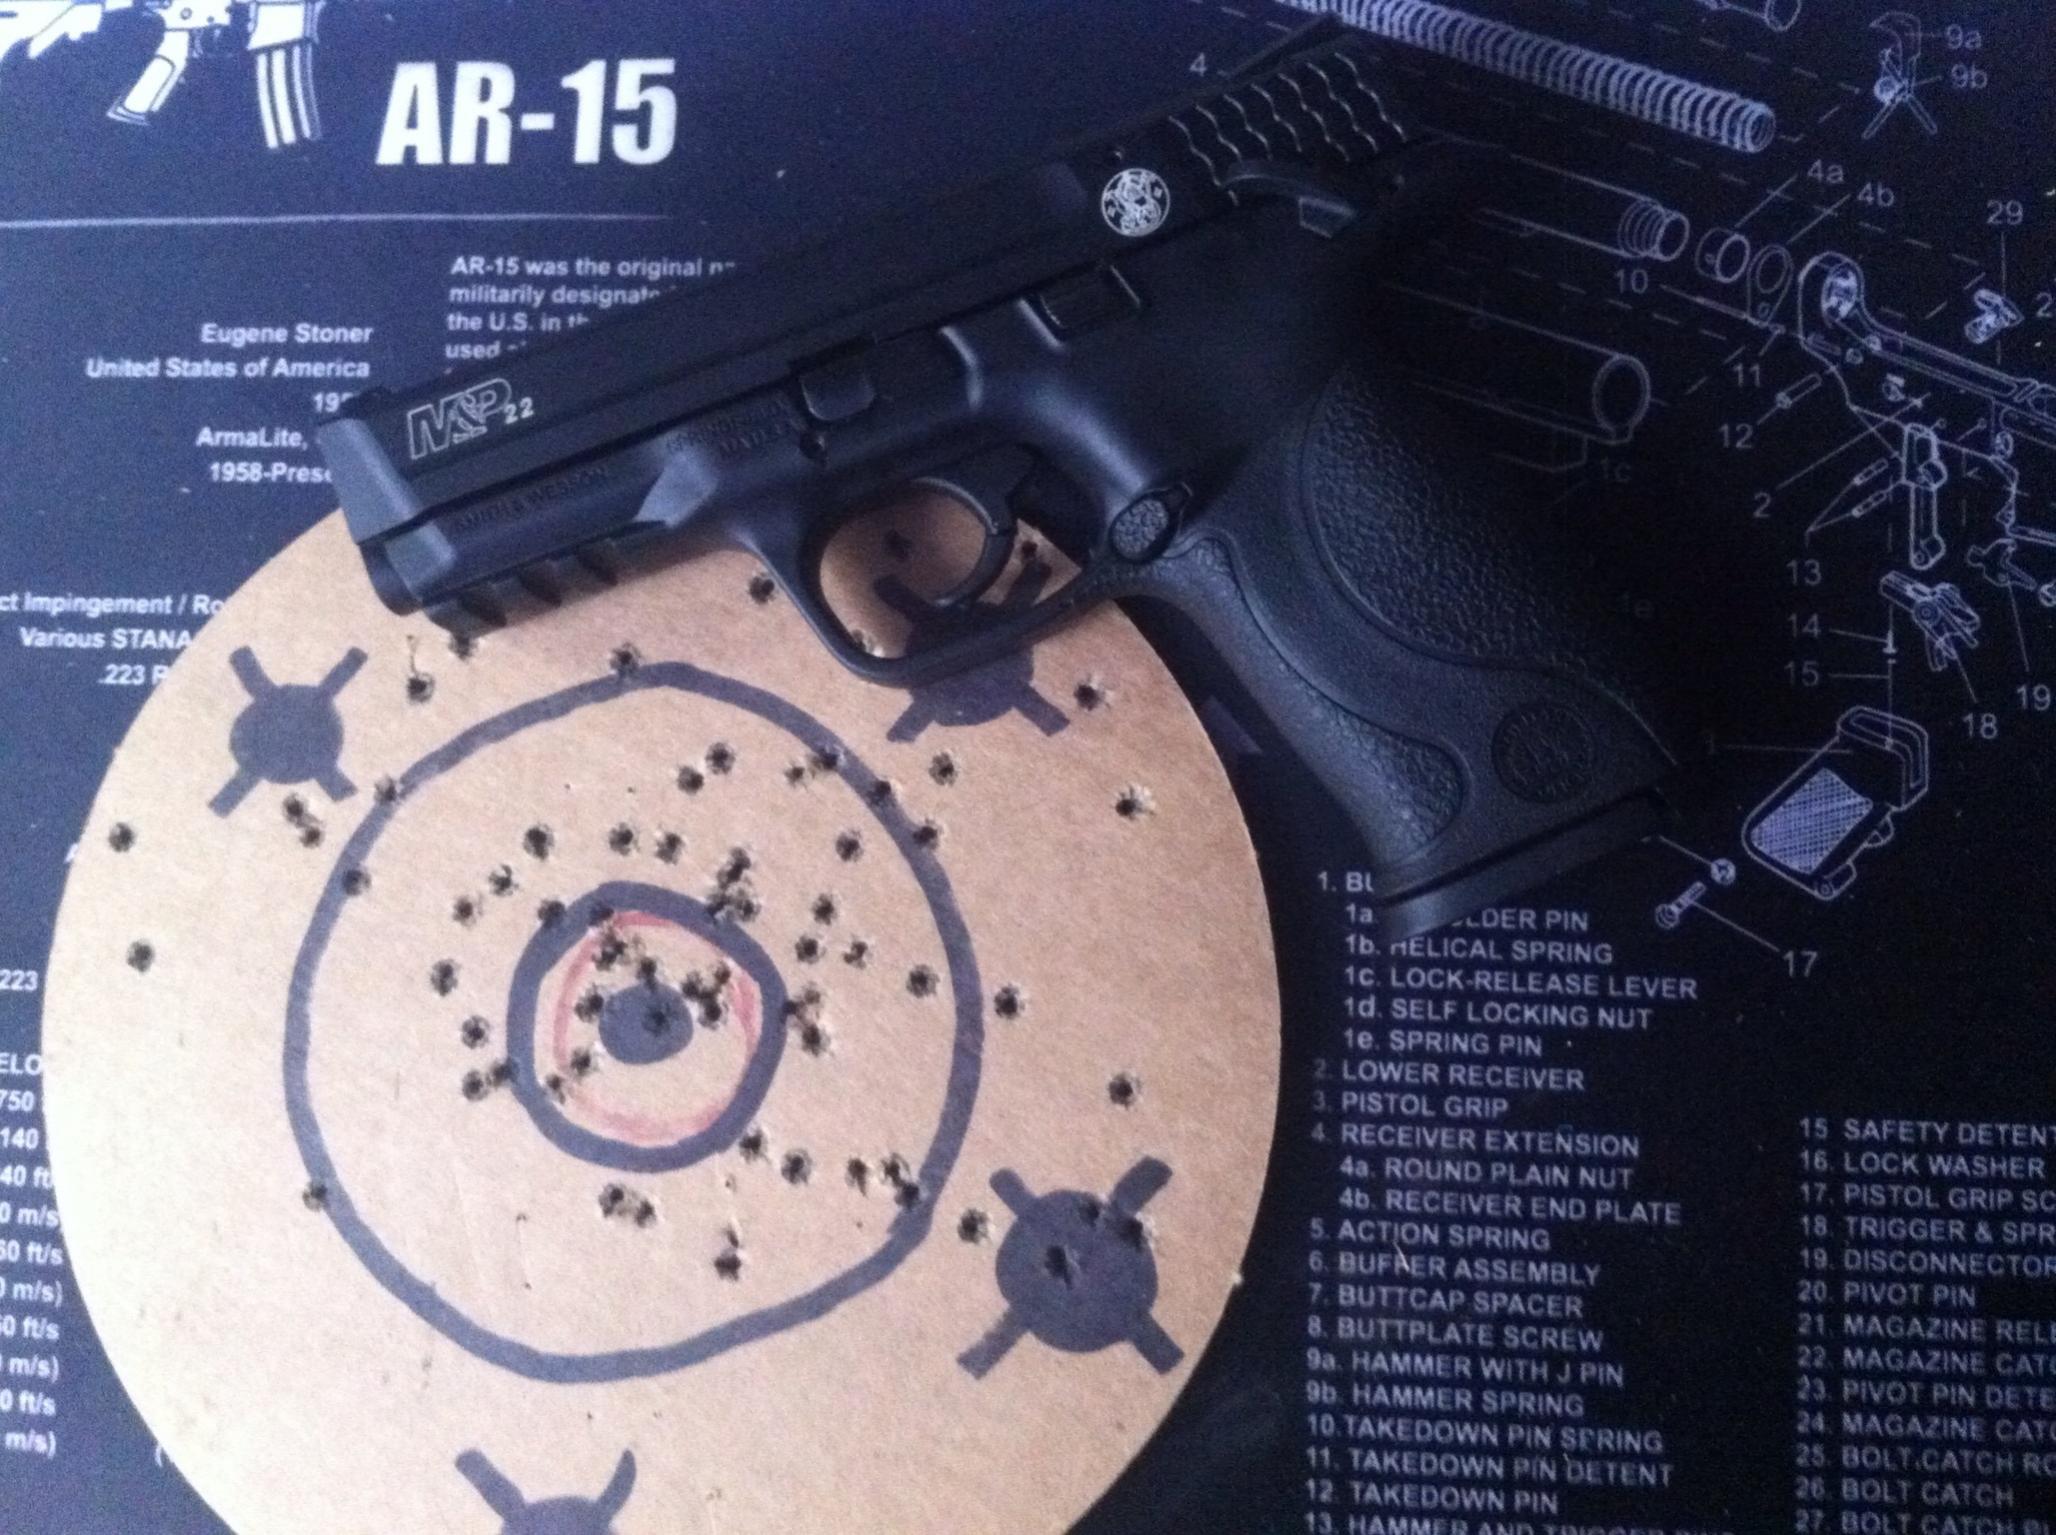 First impressions M&P 22 pistol-image.jpg